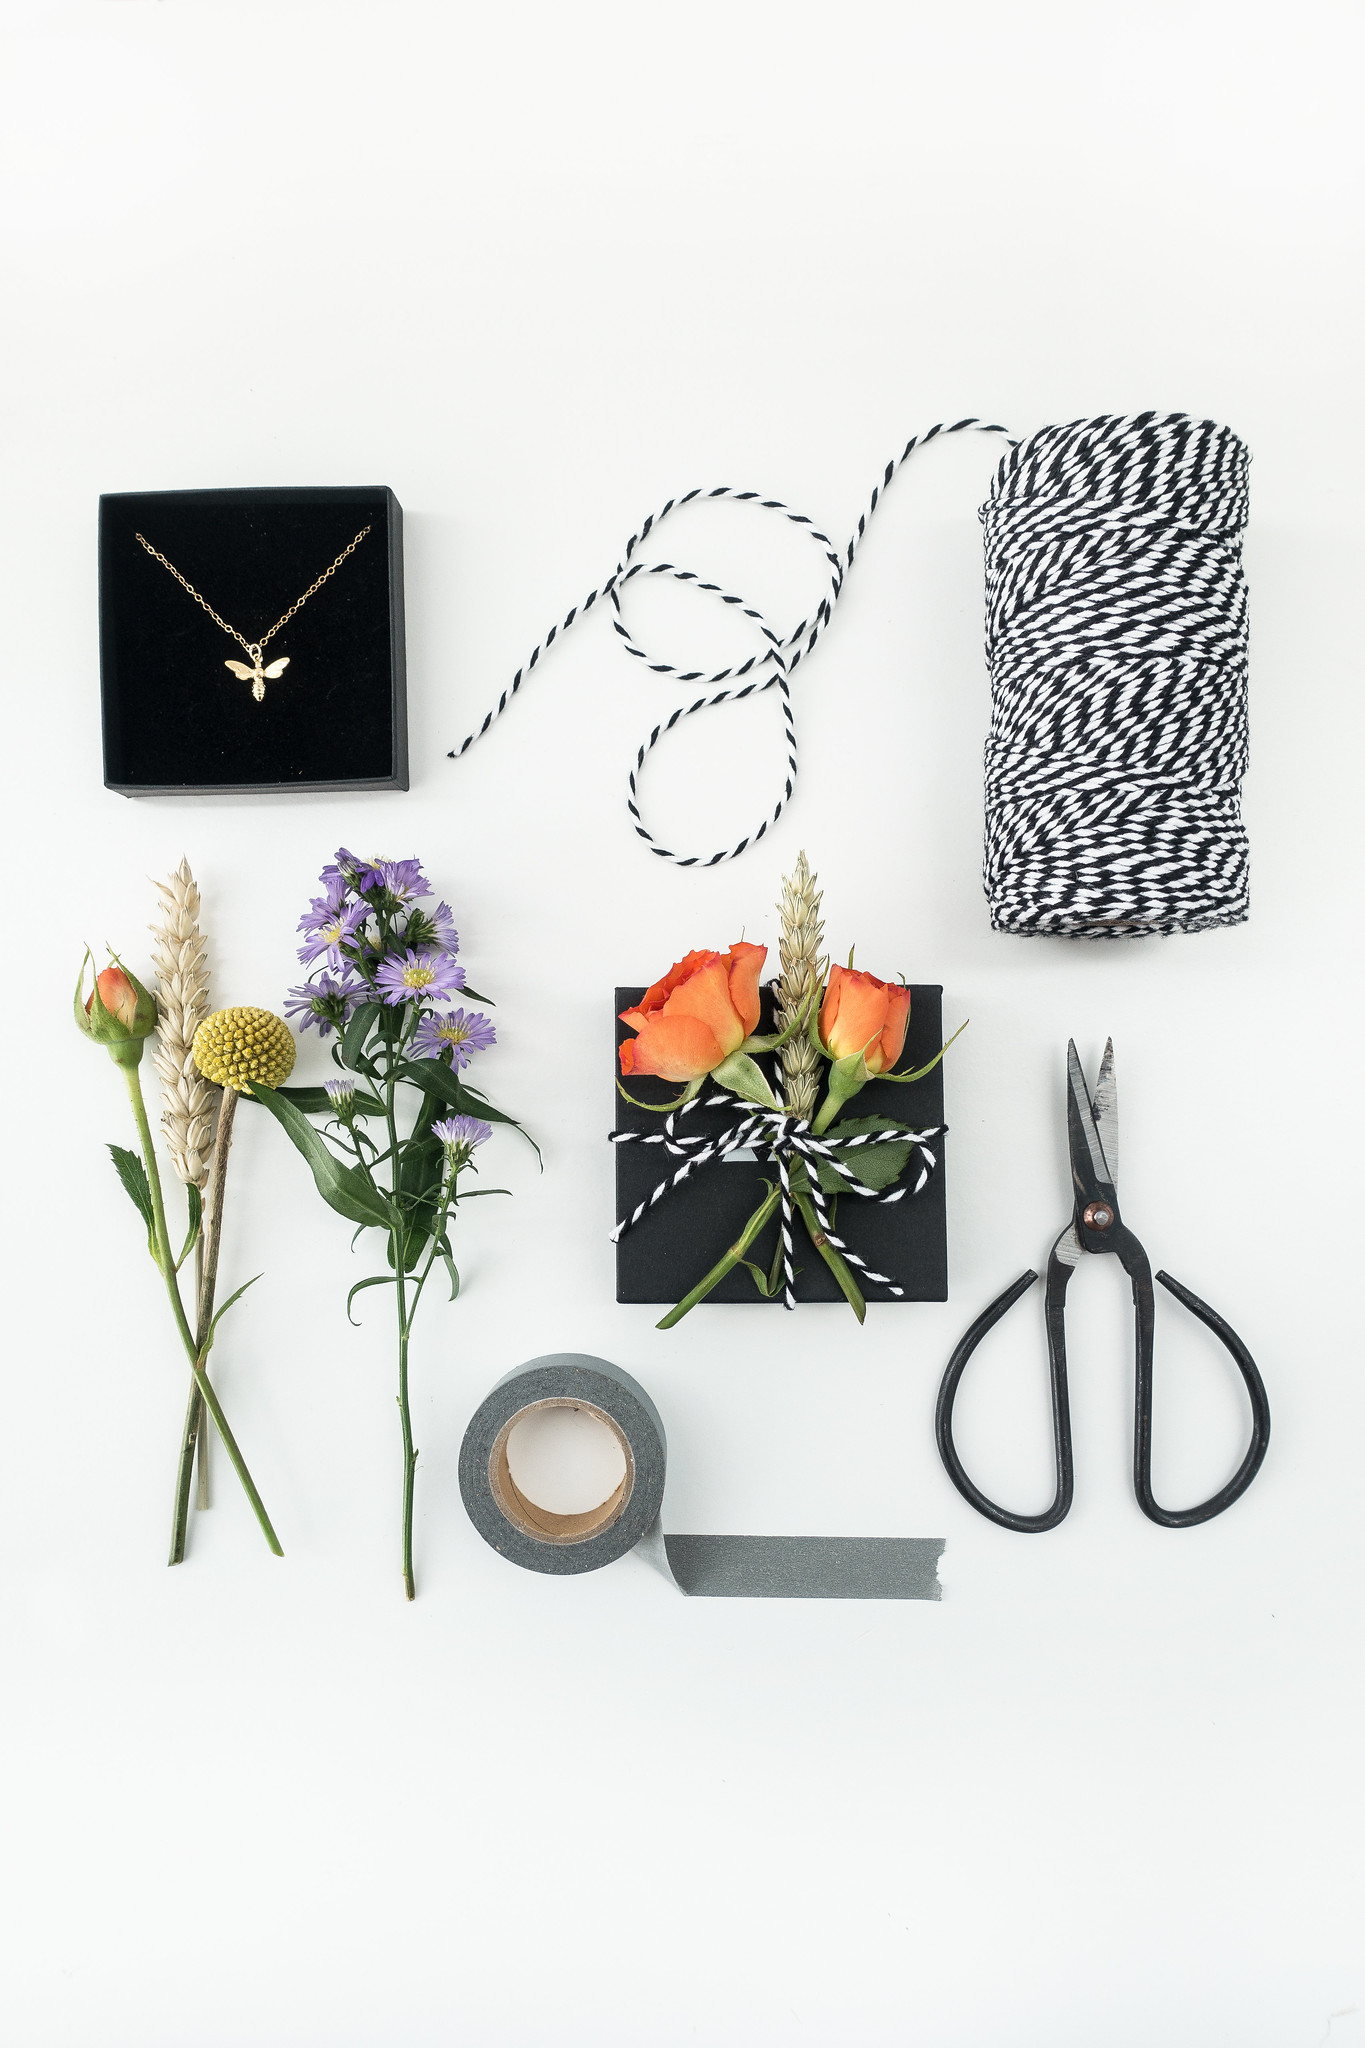 That's A Wrap: DIY Gift Wrap Ideas